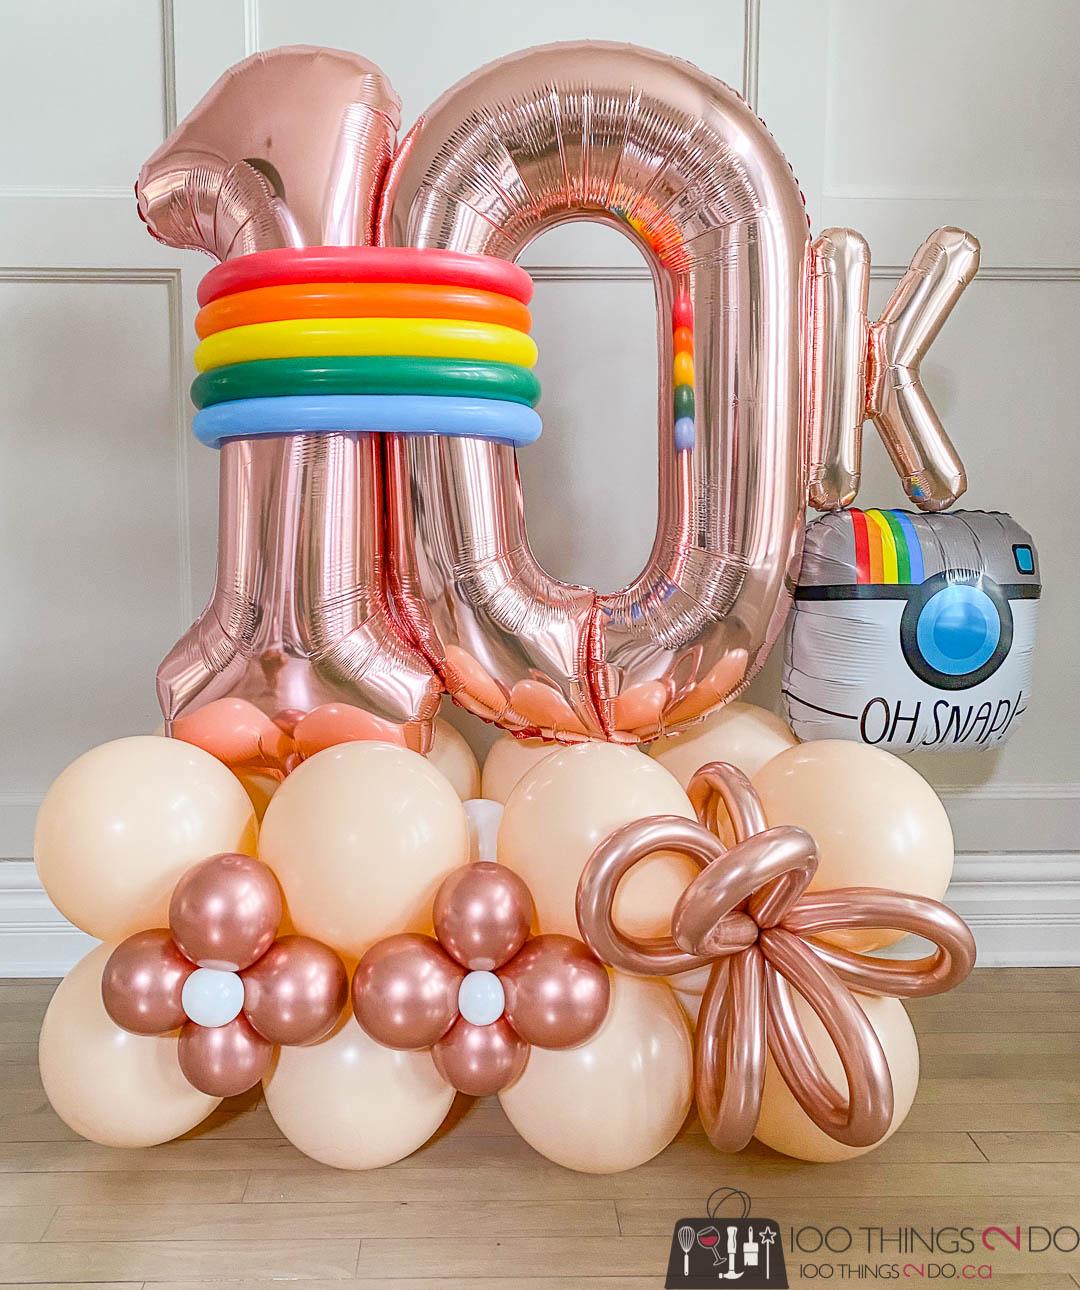 Instagram 10K, 10,000 followers, 10K balloons, 10K balloon bouquet